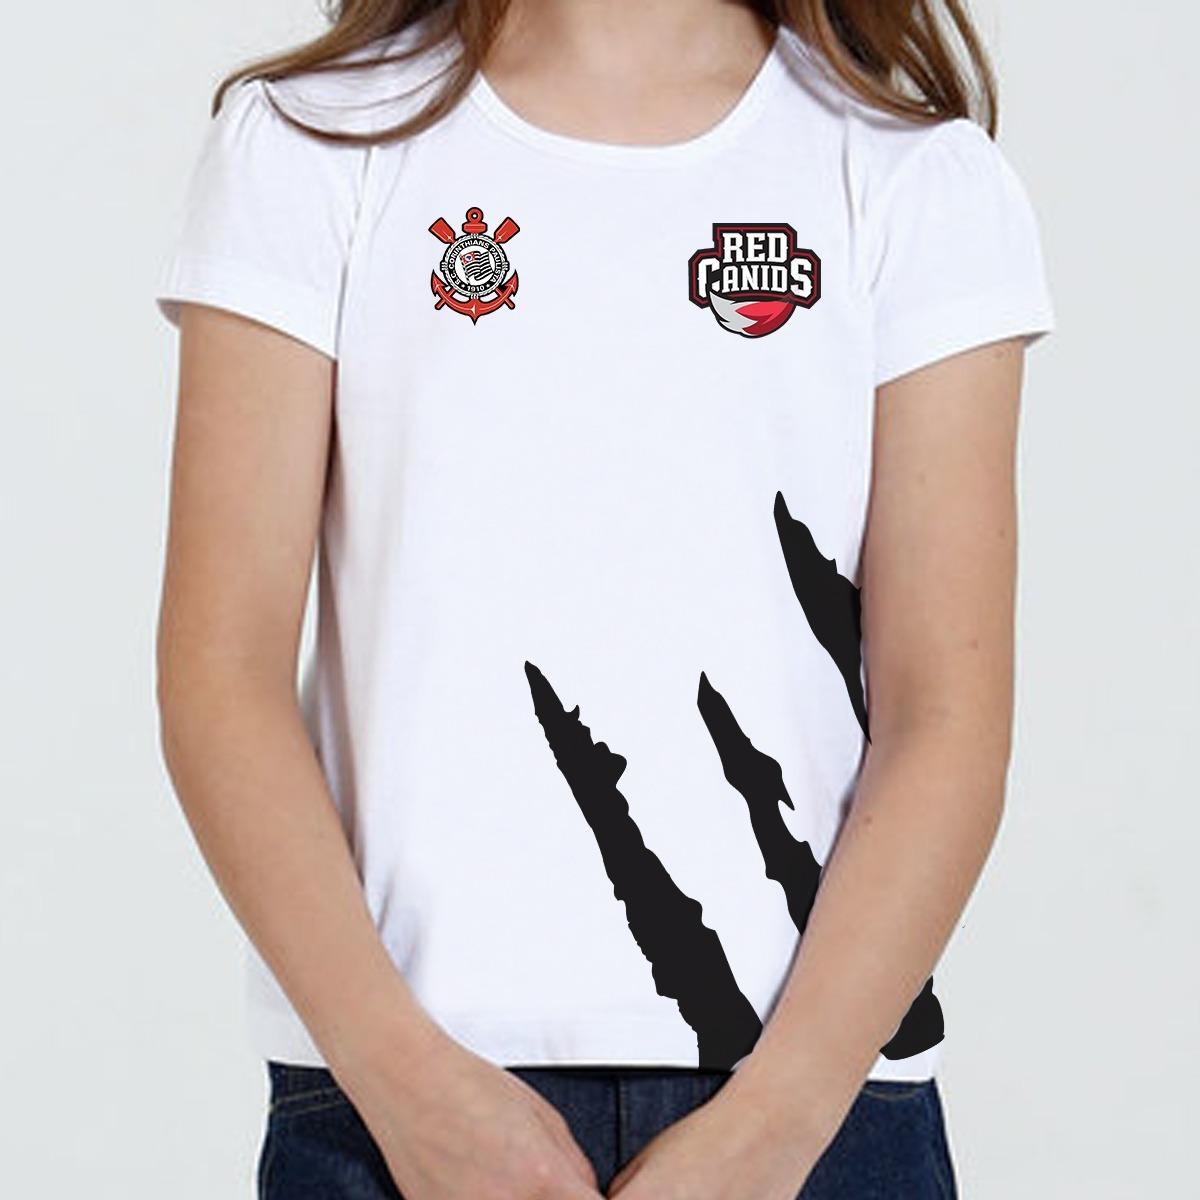 Camiseta Camisa Infantil Feminina- Red Canids Corinthians - R  29 52a6e18f926aa